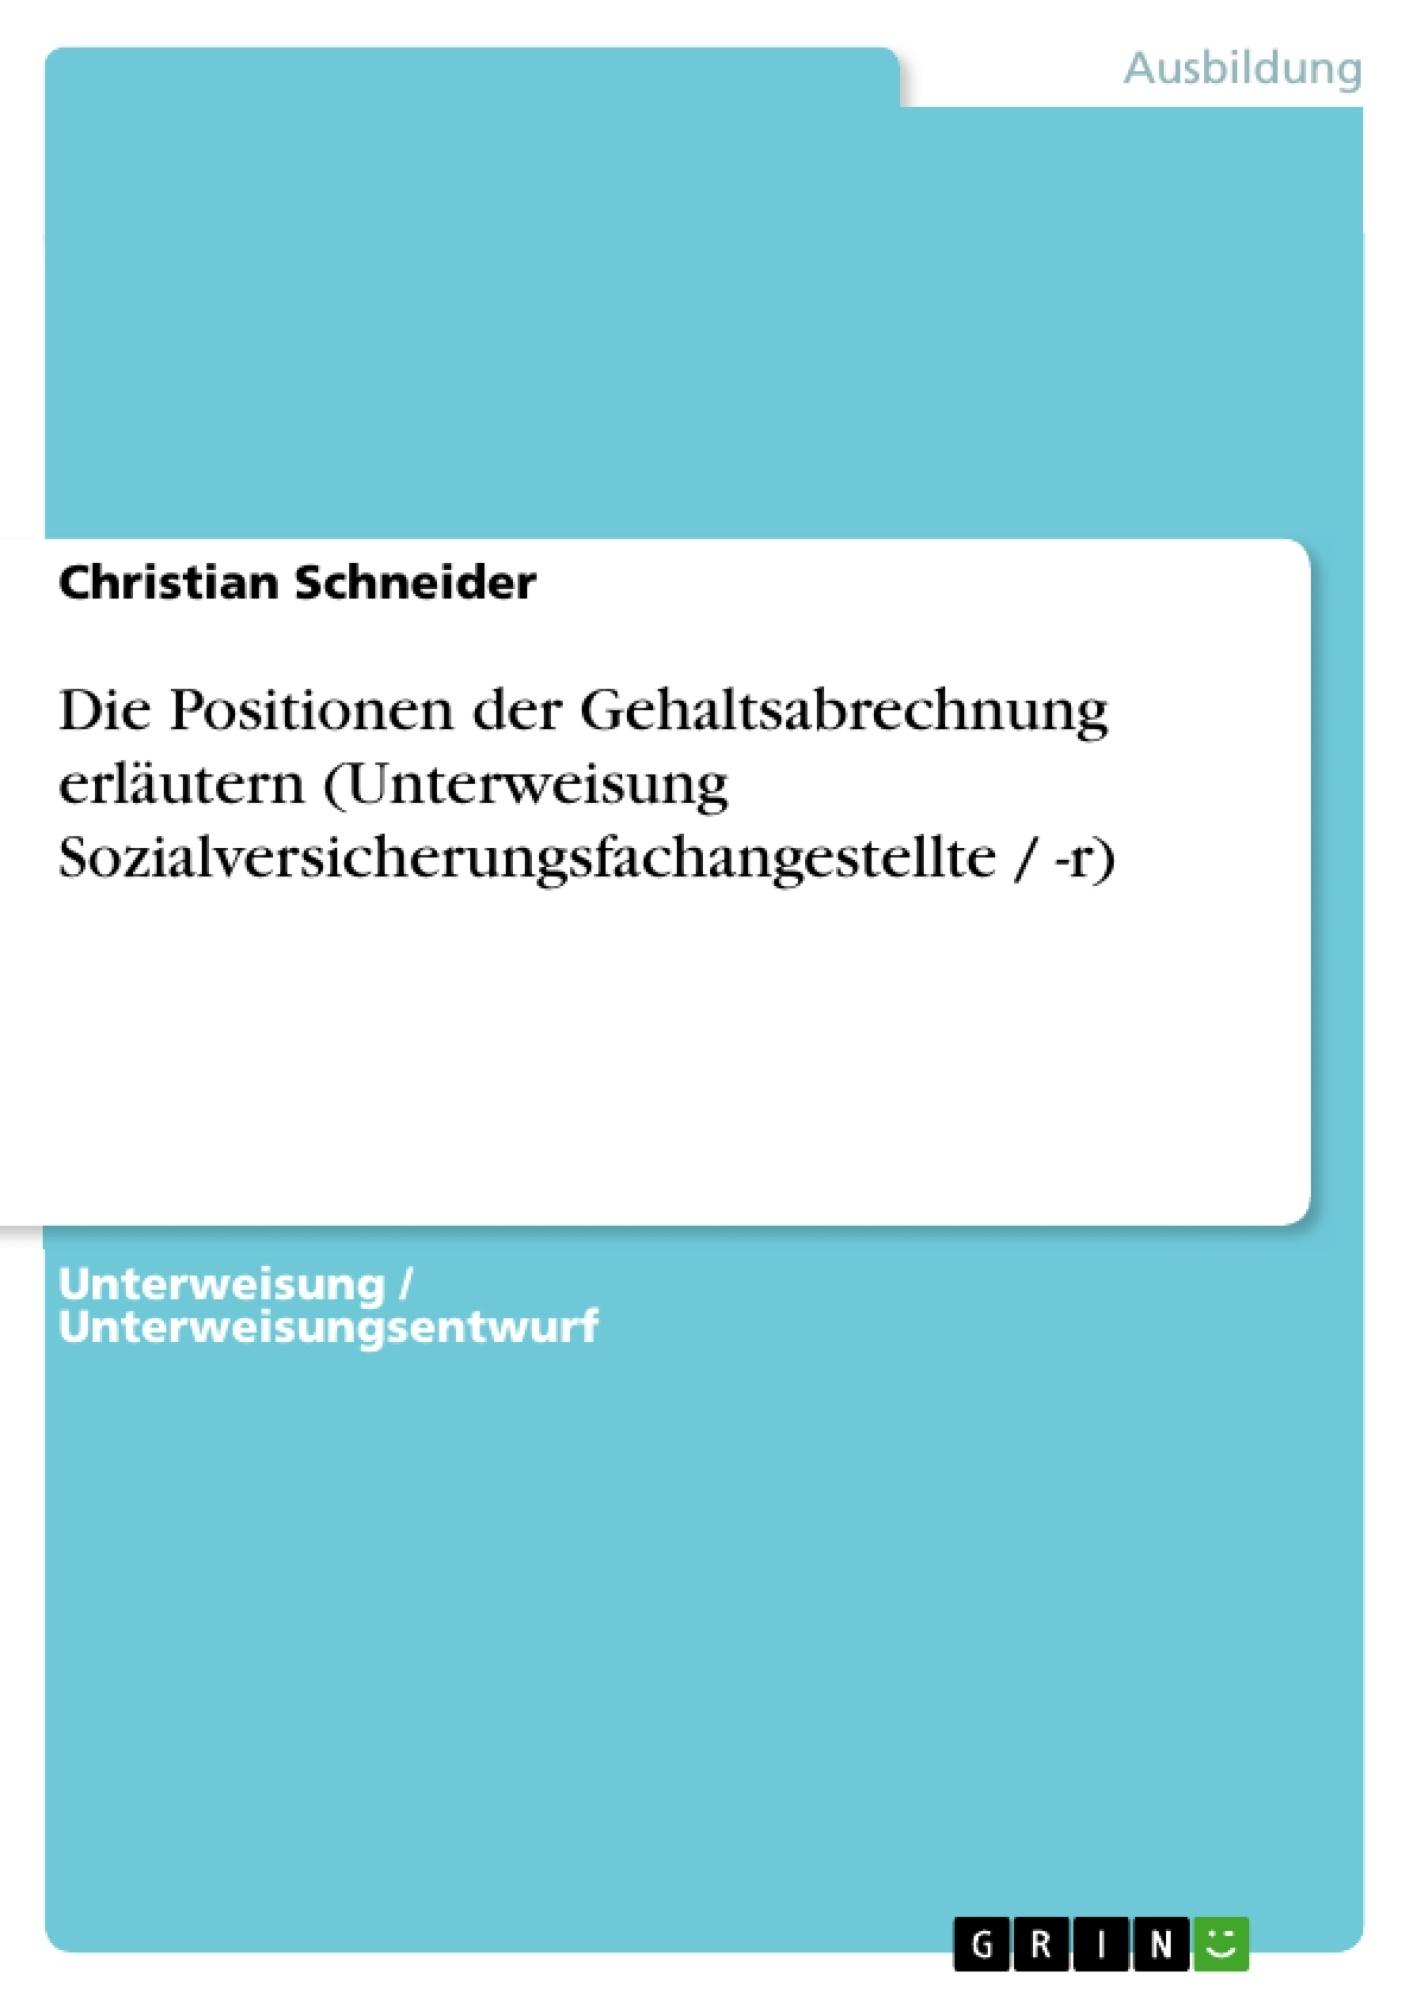 Charmant Gehaltsabrechnung Format Galerie - FORTSETZUNG ARBEITSBLATT ...